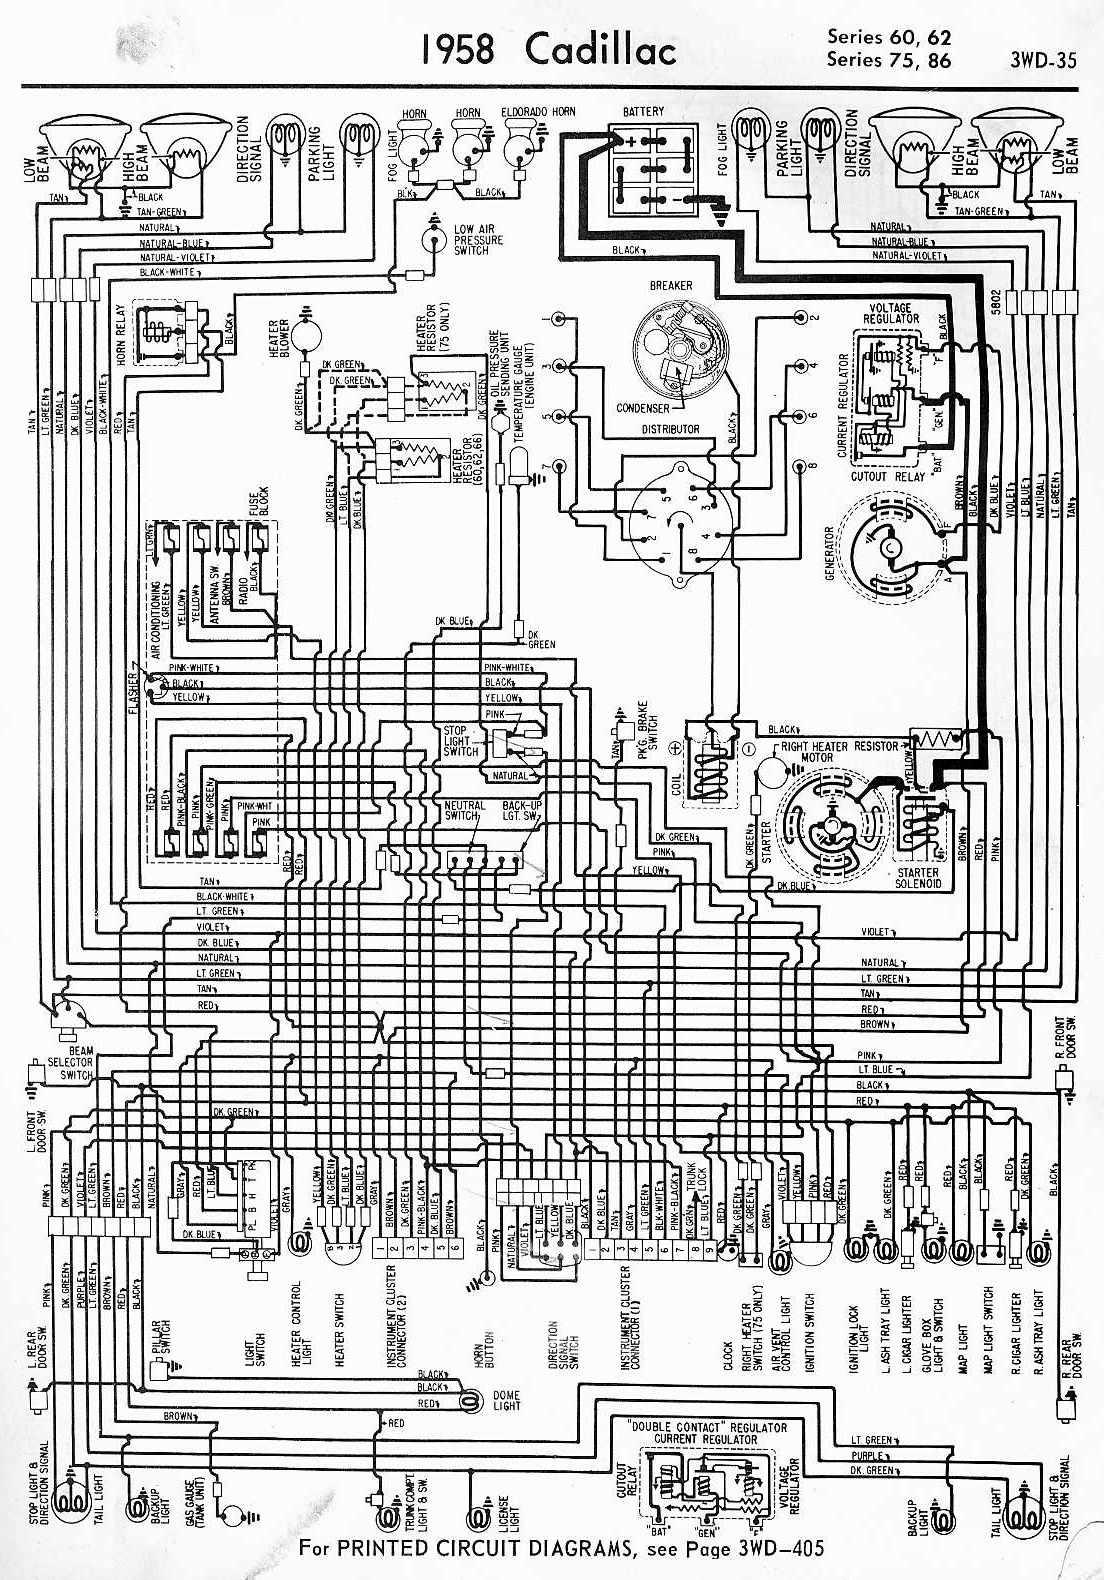 1968 cadillac air conditioner wiring diagram simple wiring schema 1994 cadillac deville speaker wiring diagram 1979 cadillac deville wiring diagram [ 1104 x 1580 Pixel ]